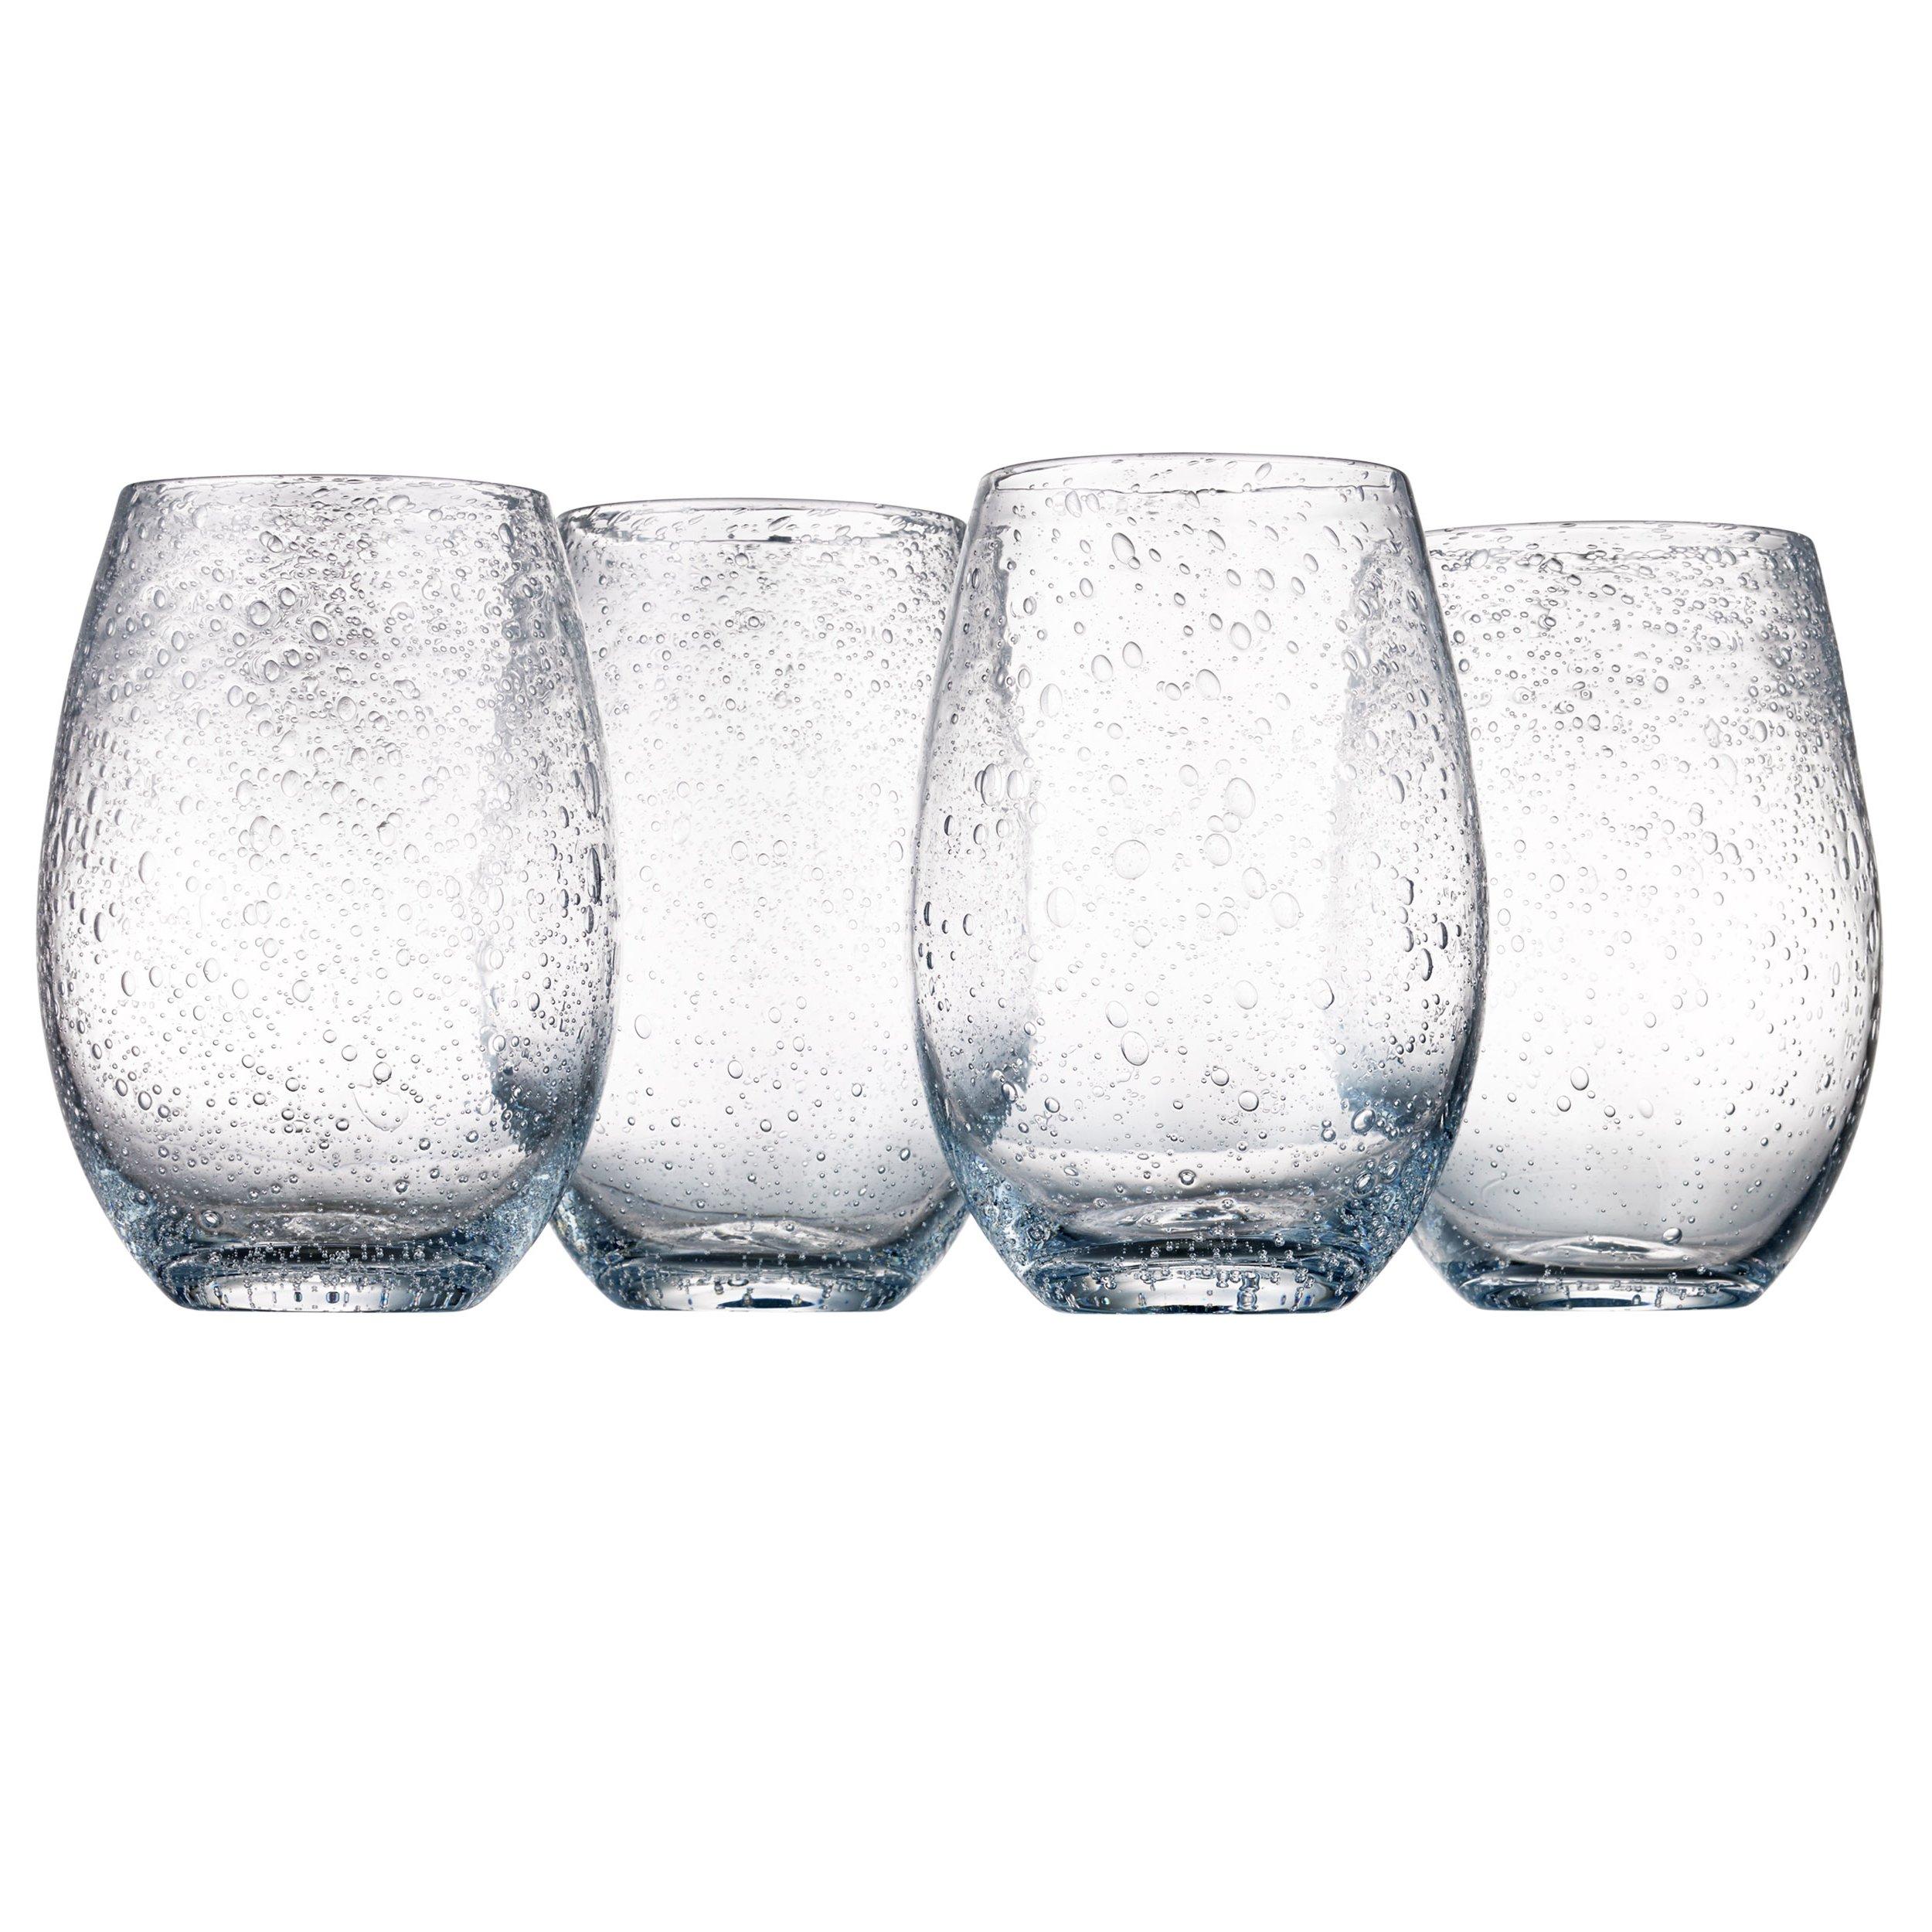 Artland Iris Stemless Glasses, Clear, Set of 4